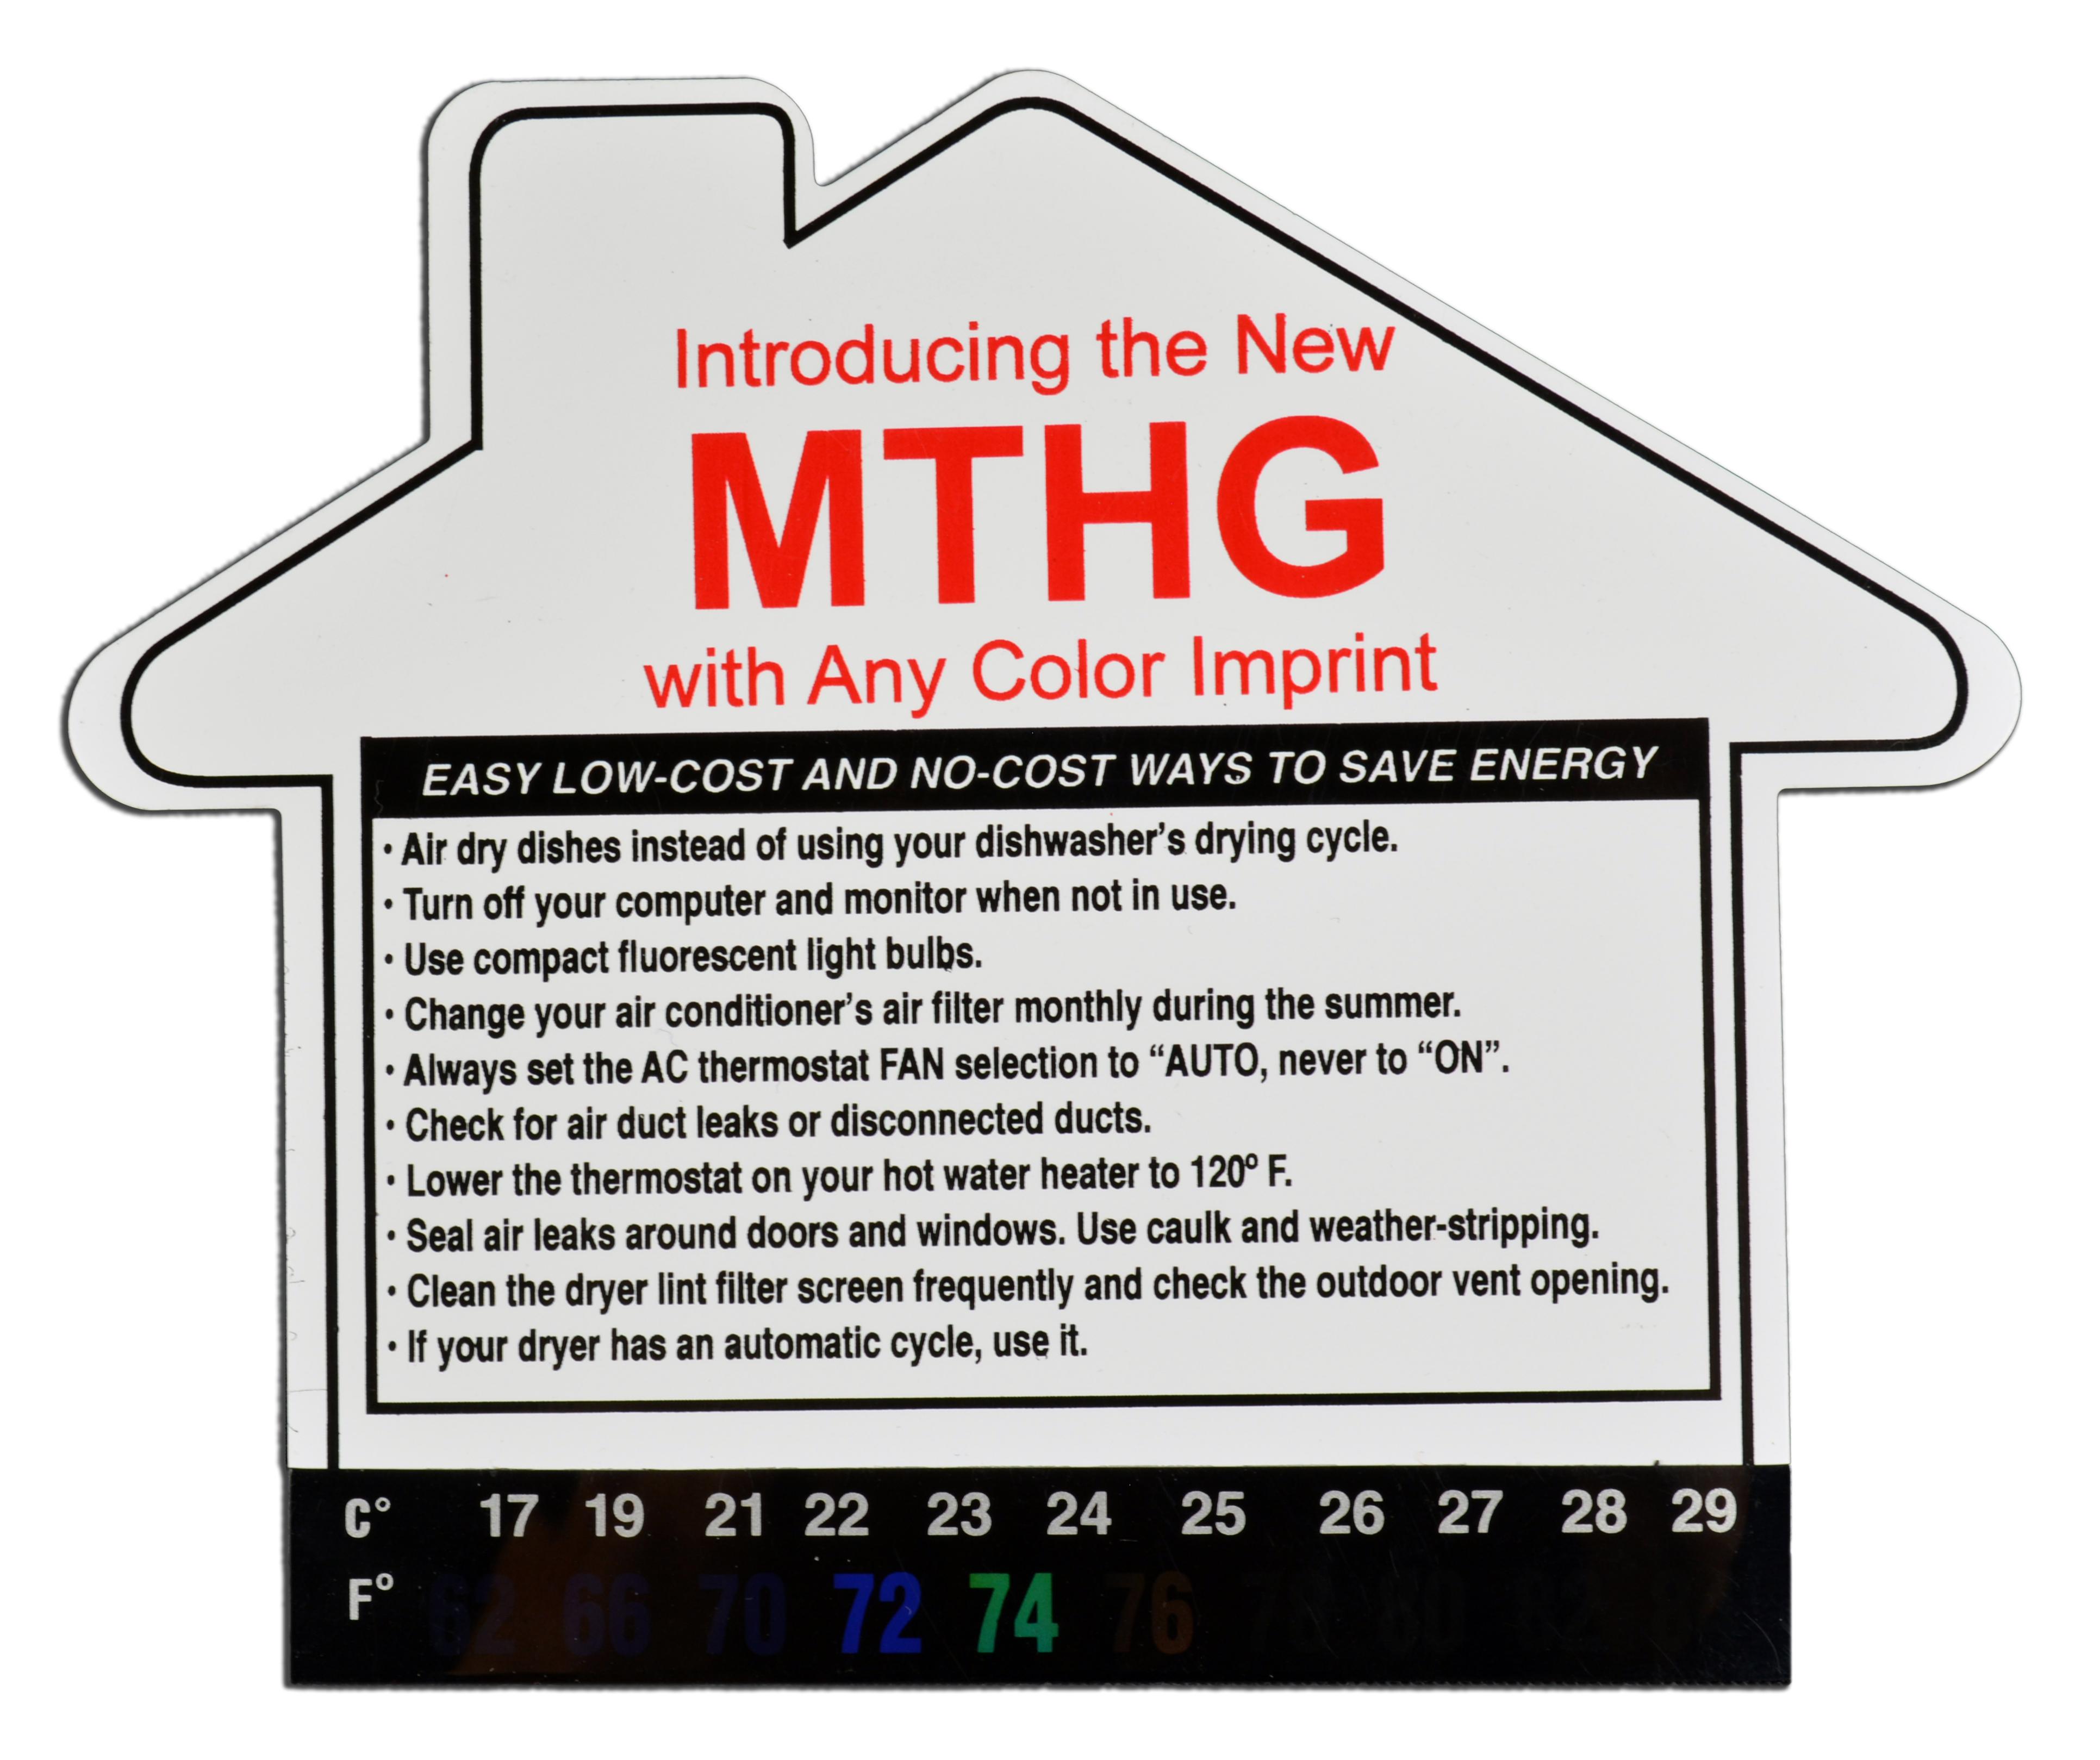 MTHG Image